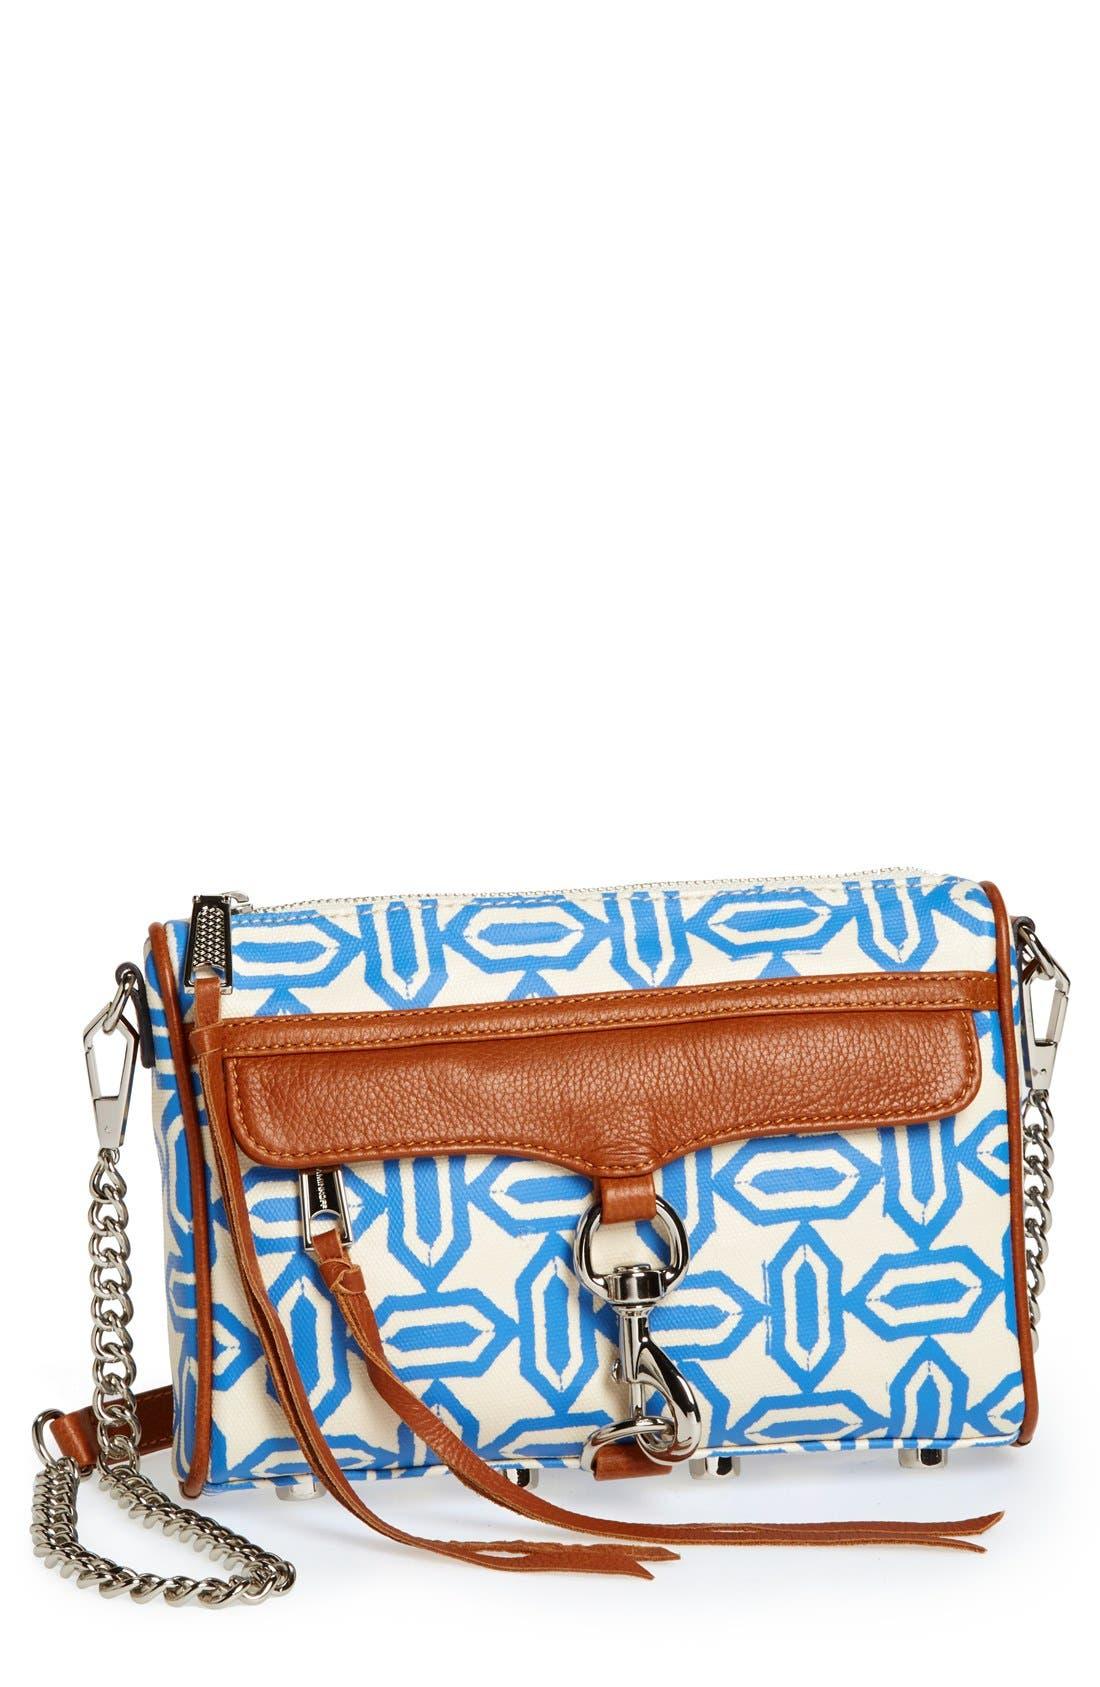 Alternate Image 1 Selected - Rebecca Minkoff 'Mini MAC' Crossbody Bag